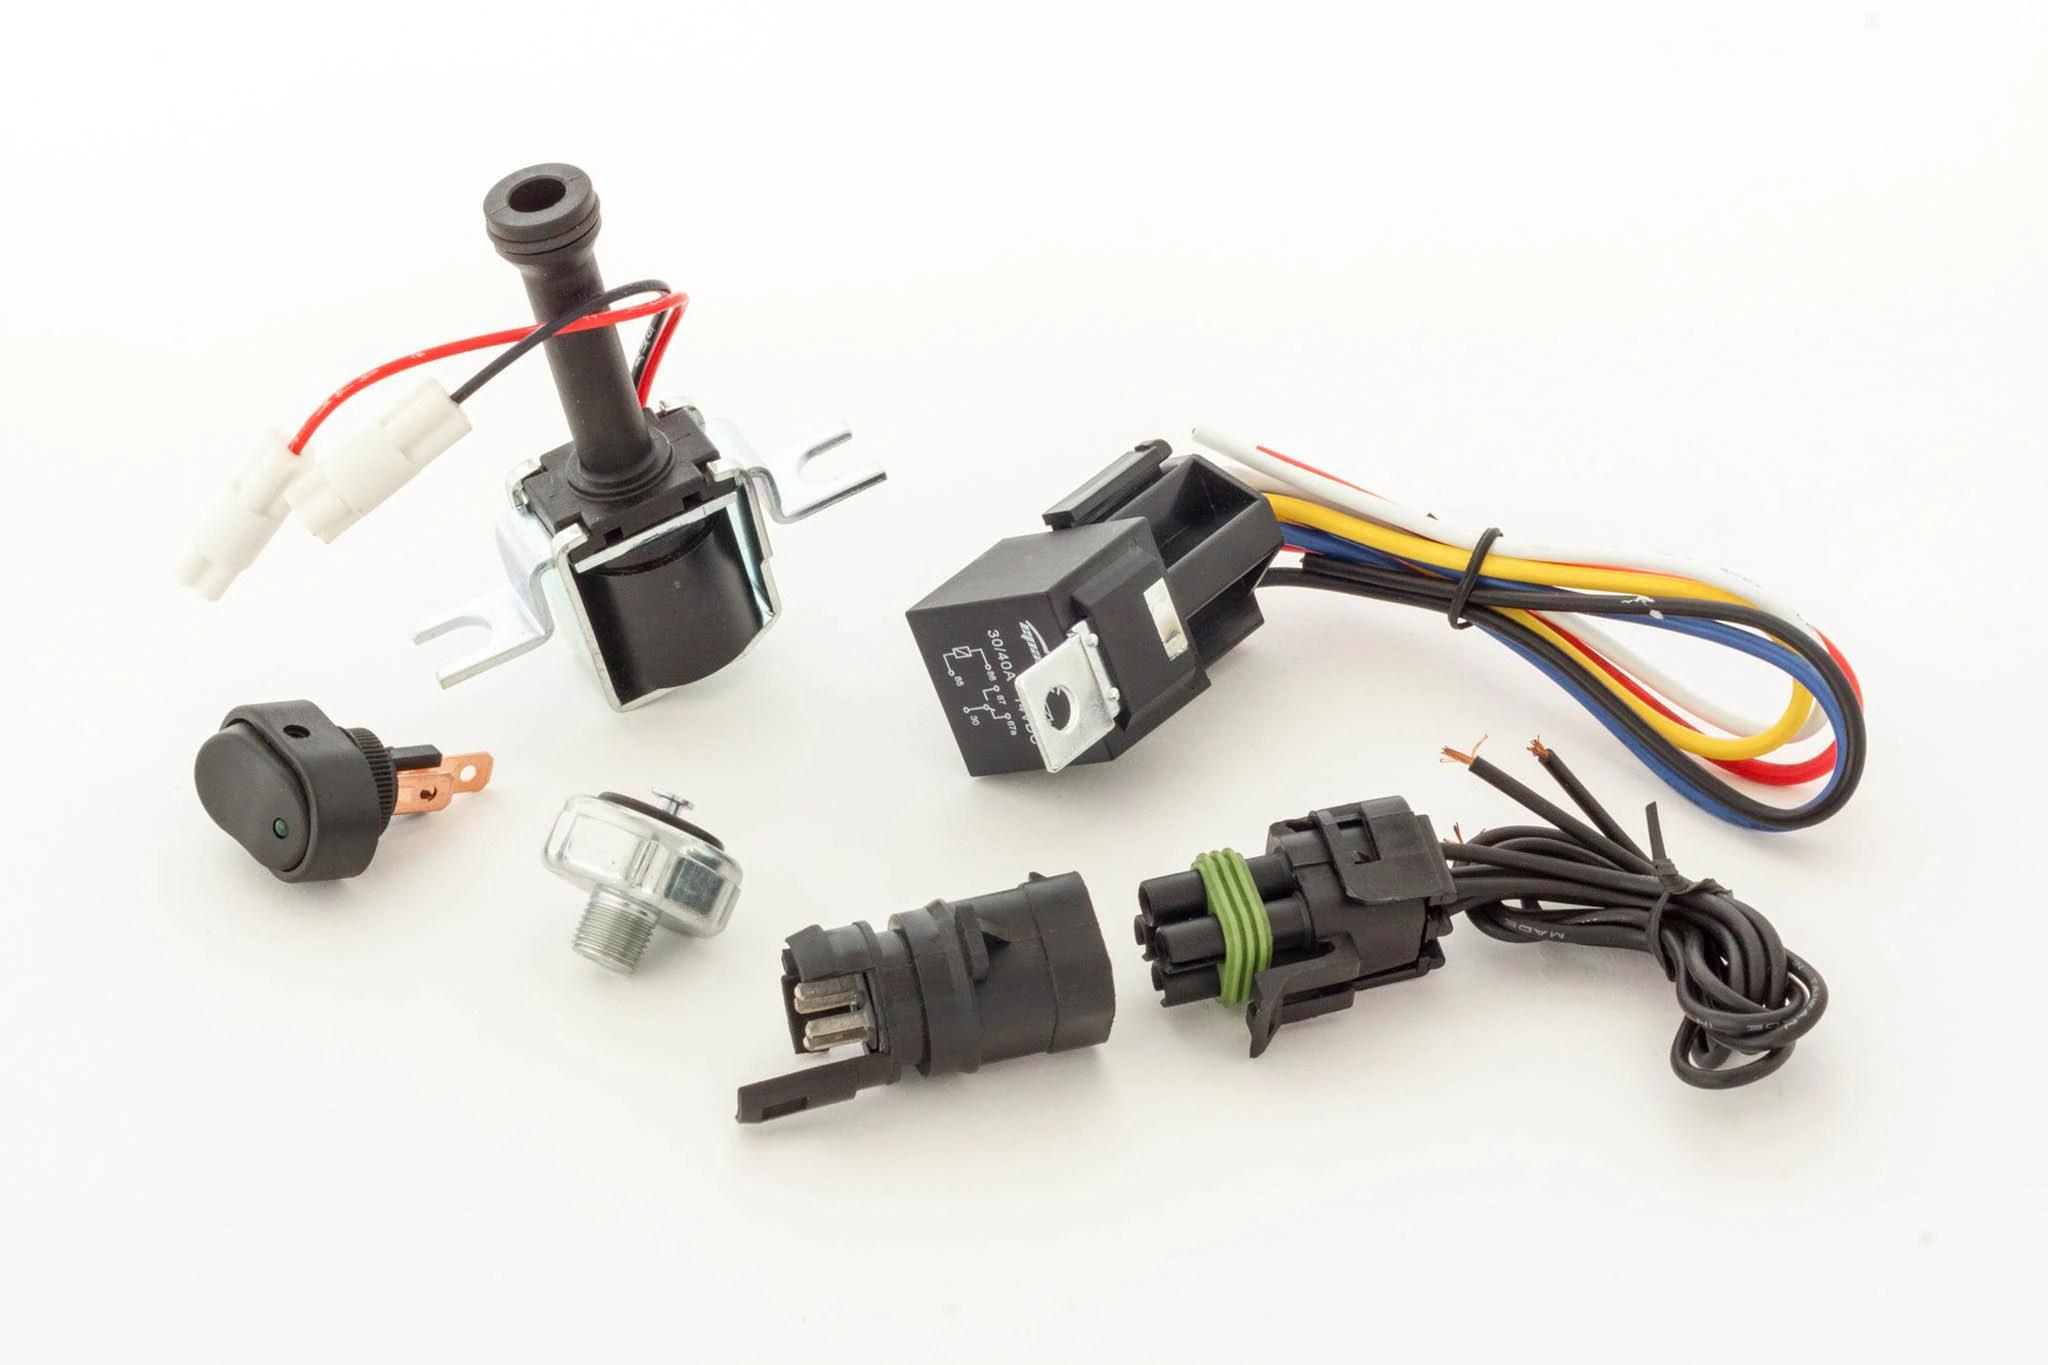 700r4 converter lockup wiring diagram simple cpu torque chevy turbo